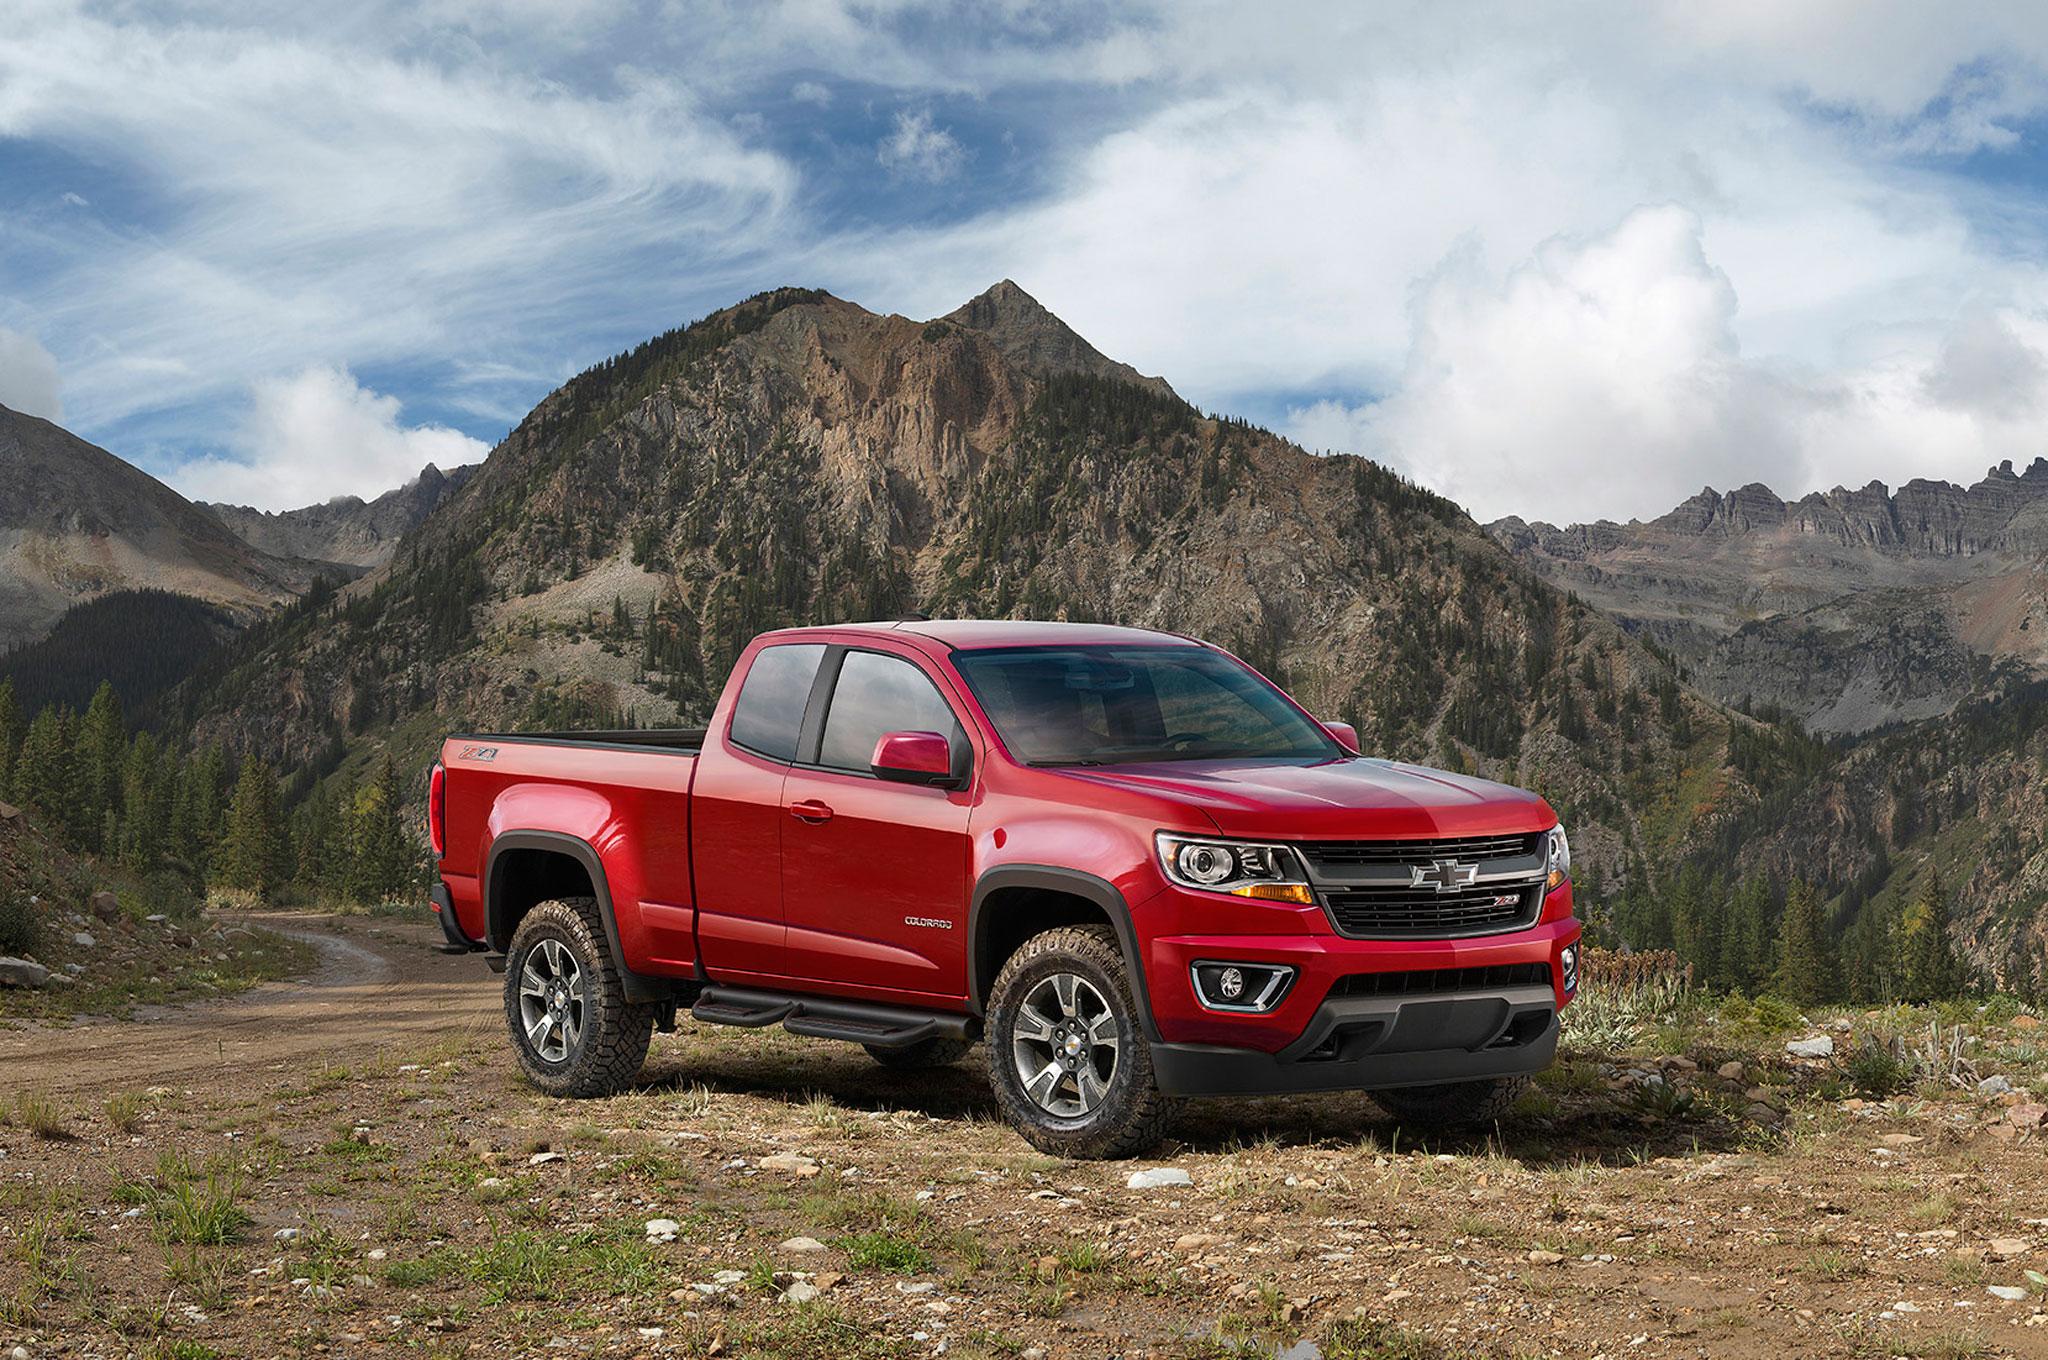 Chevrolet Debuts Off-Road Ready Colorado Z71 Trail Boss